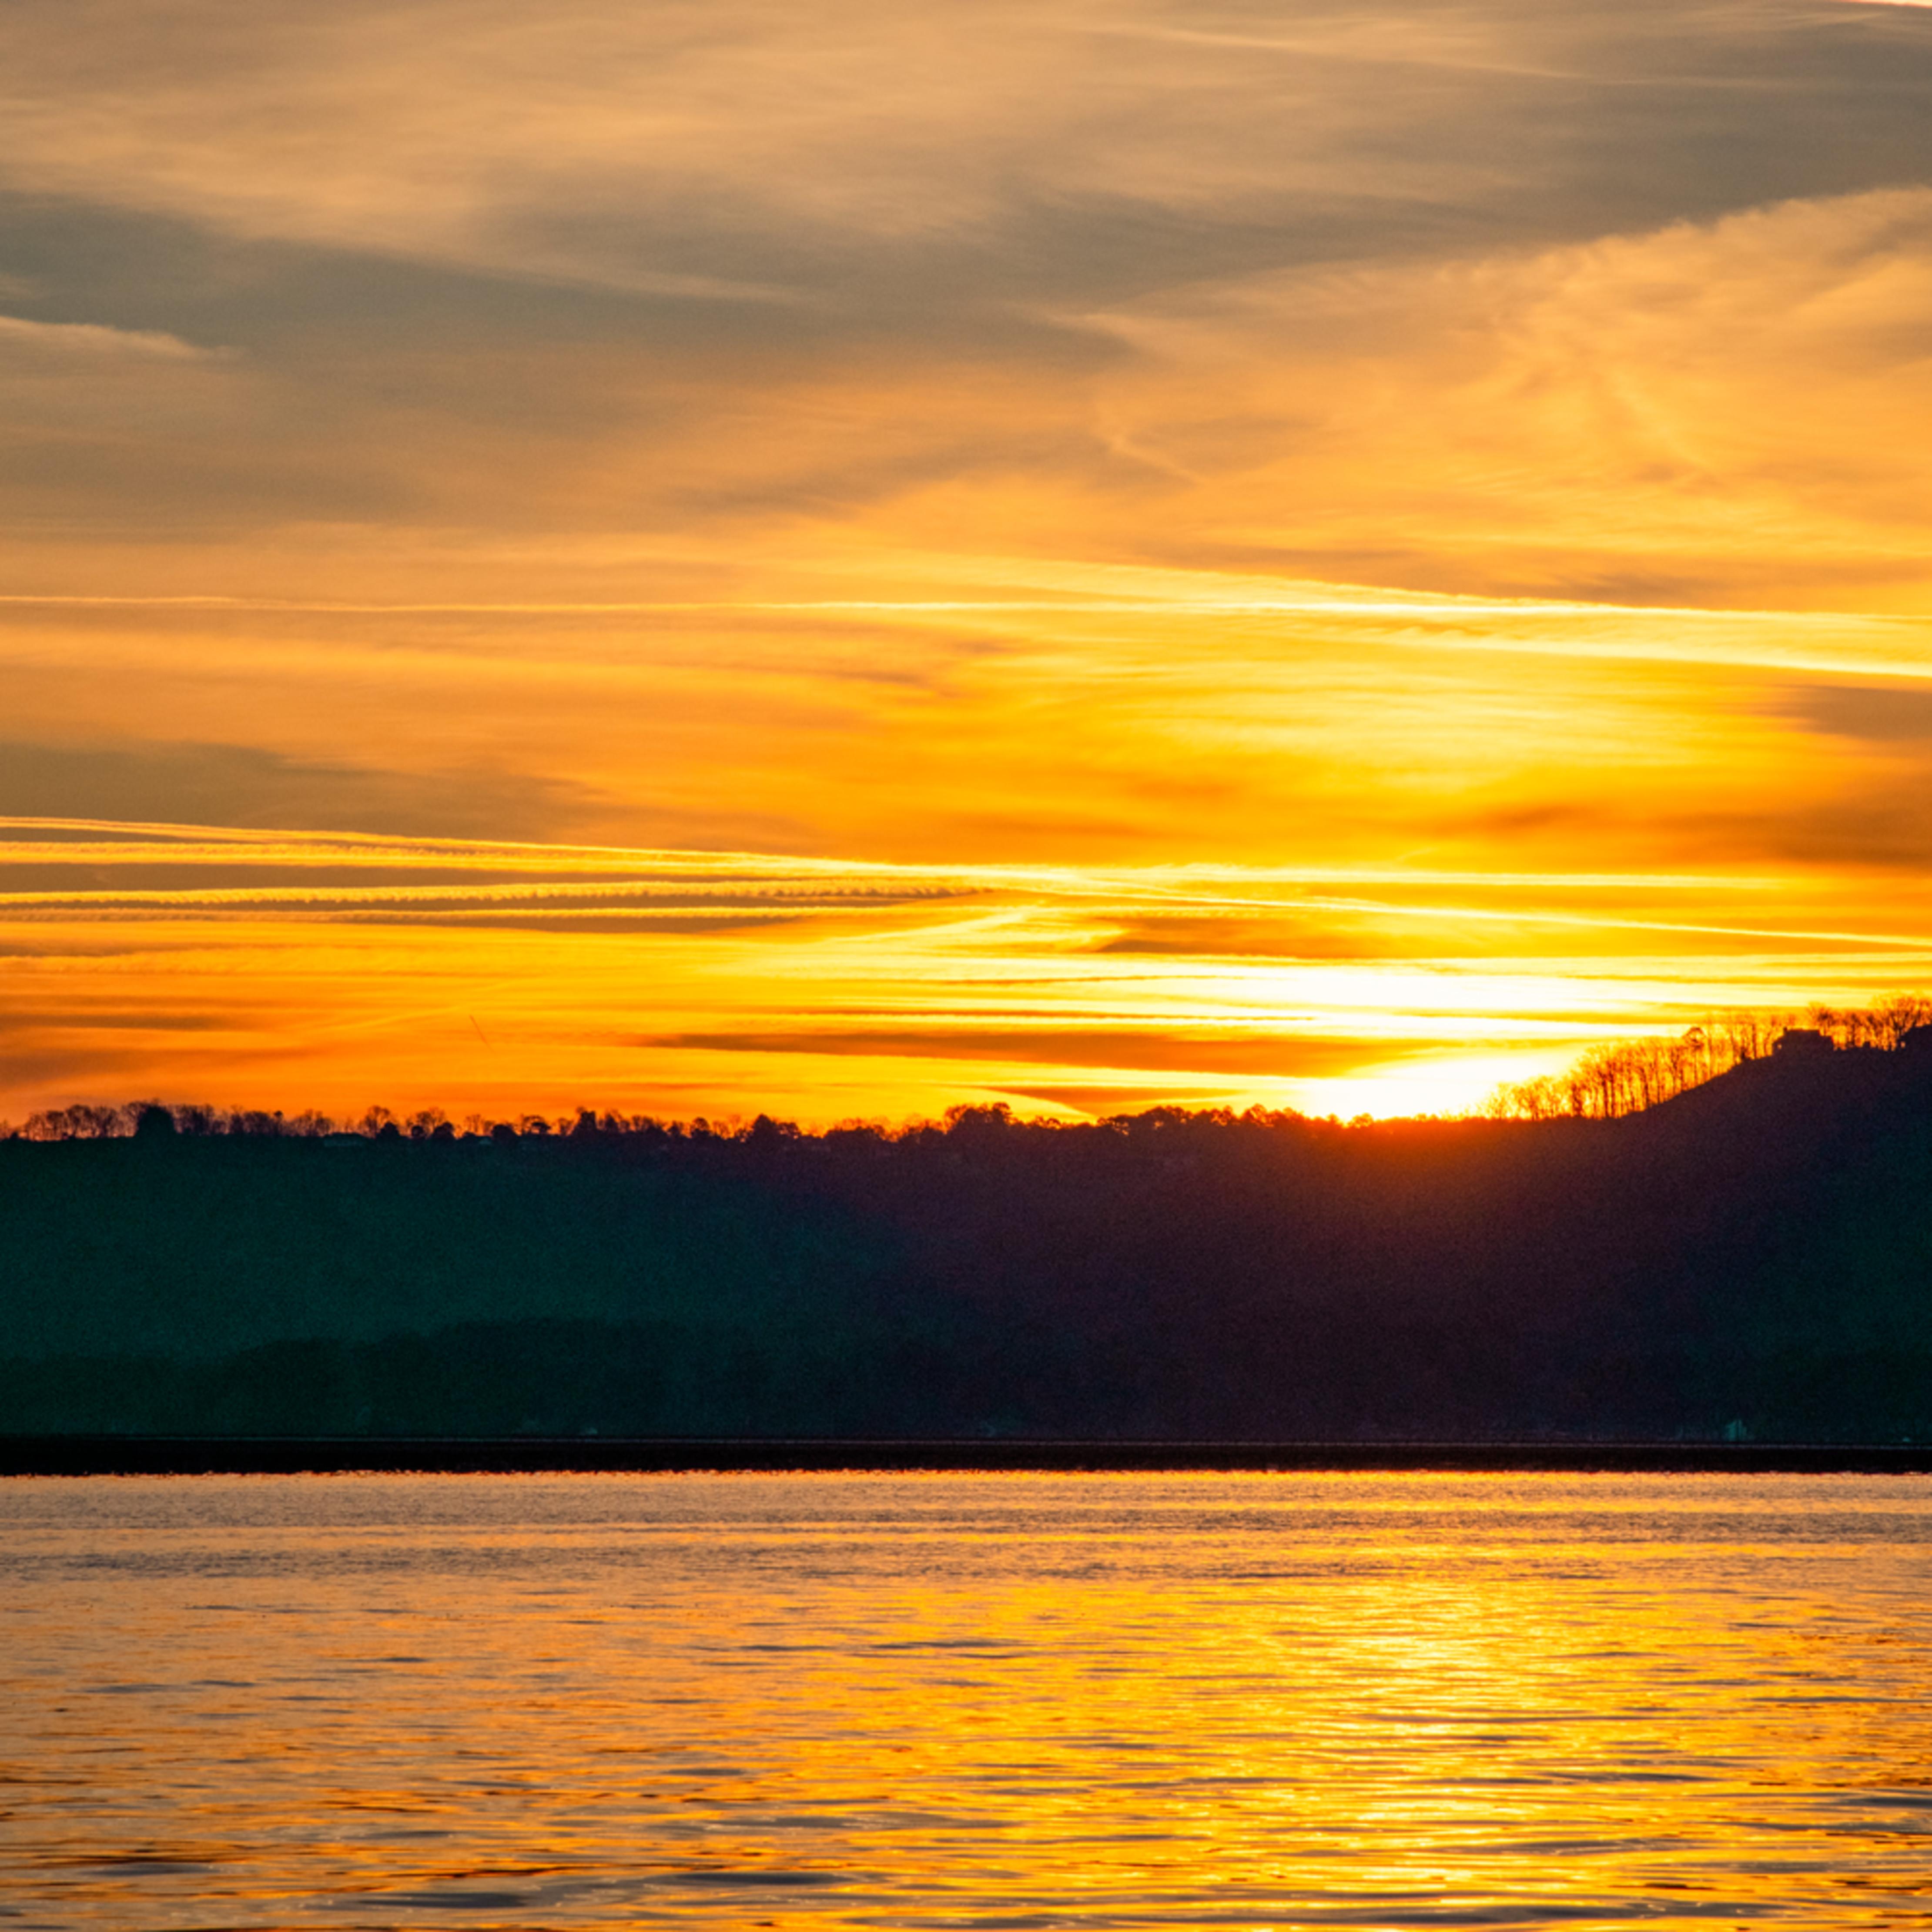 Andy crawford photography lake guntersville sunrise u1px7t